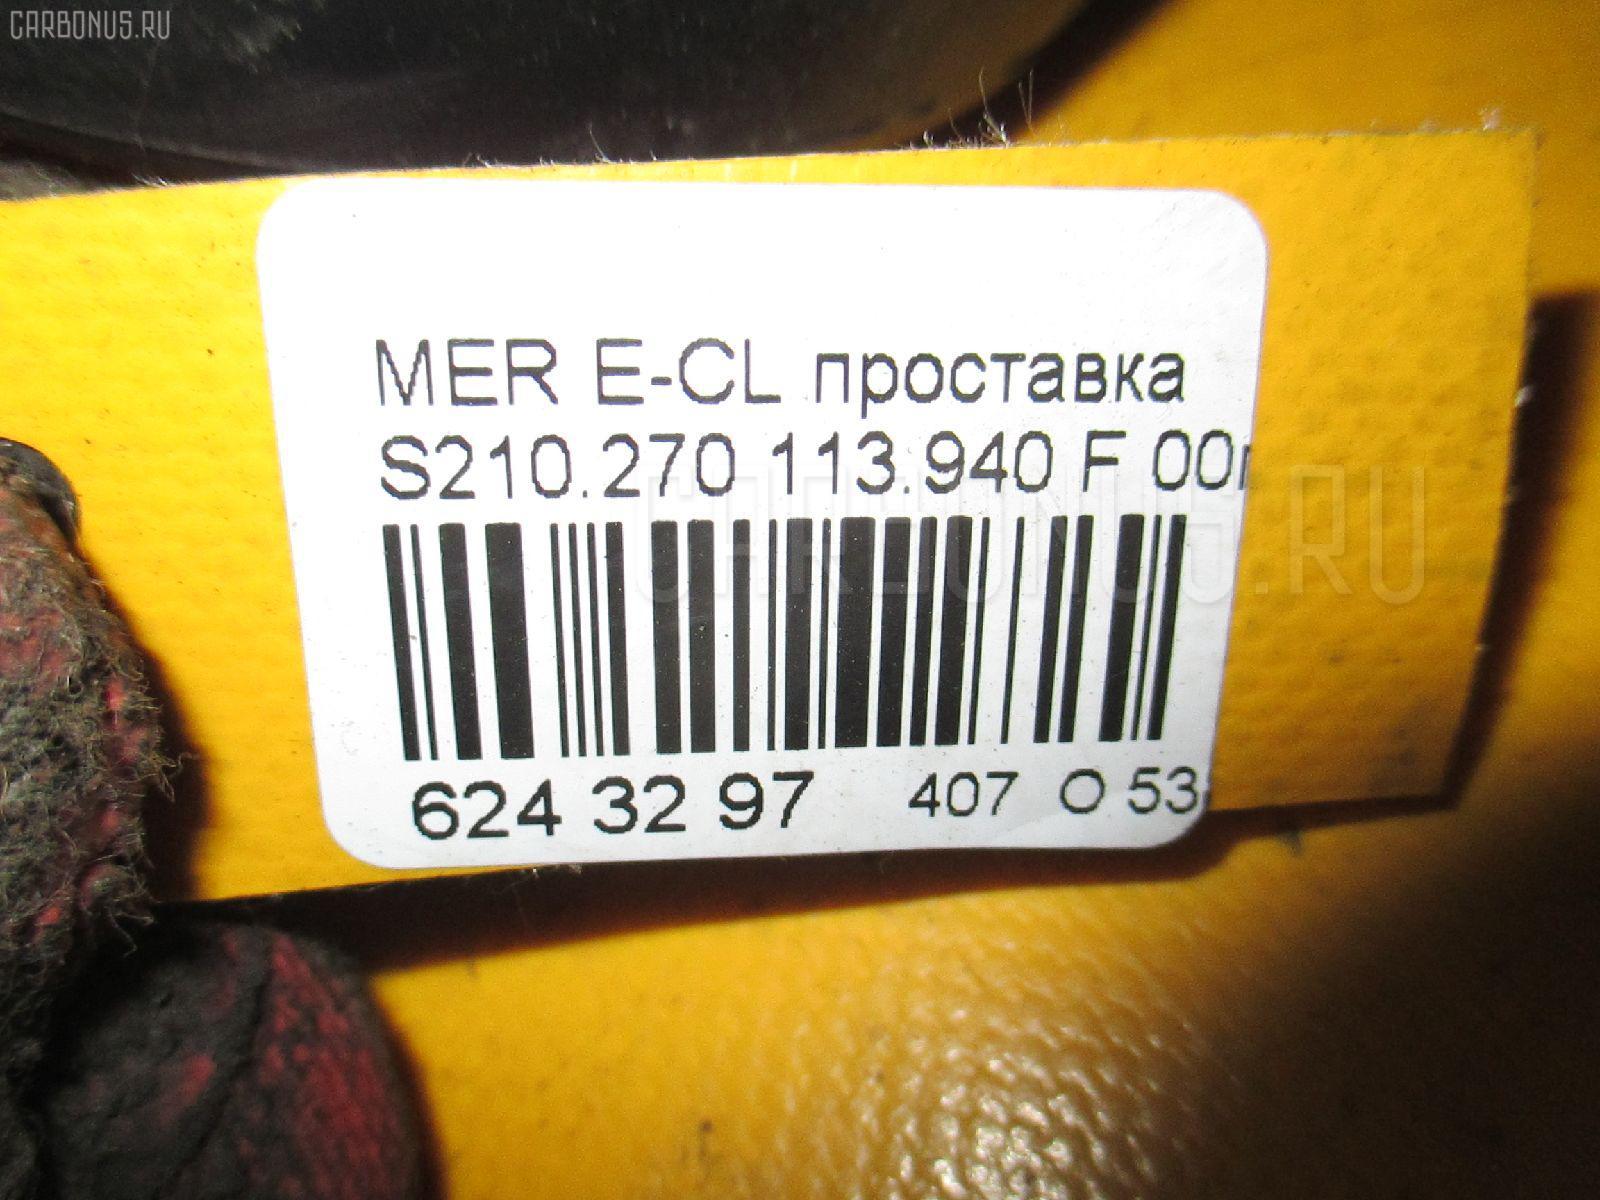 Проставка MERCEDES-BENZ E-CLASS STATION WAGON S210.270 113.940 Фото 7